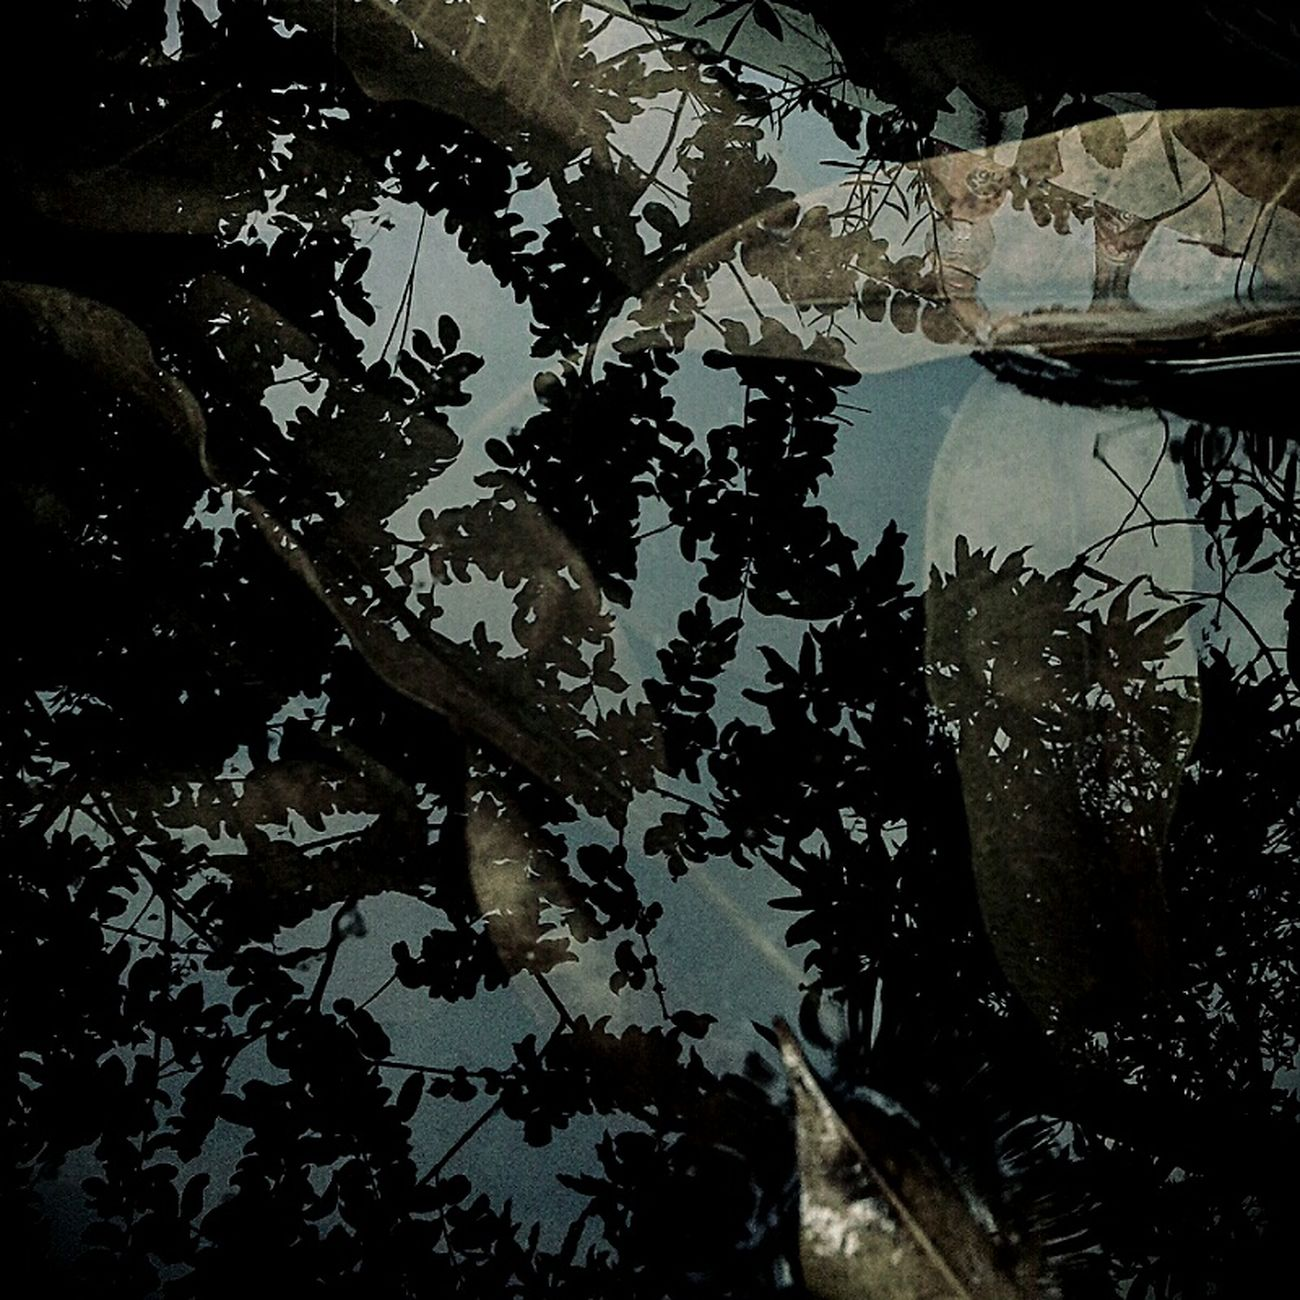 S I K L U S. Reflection Water Nature Tree Stockphoto In2nature Moodygrams Roaming Around Folk Folkgood Leaves Androidography Thetrickytree Autumnbeauty Fine Art Killingtime Hometown INDONESIA Jakarta Nusantara First Eyeem Photo